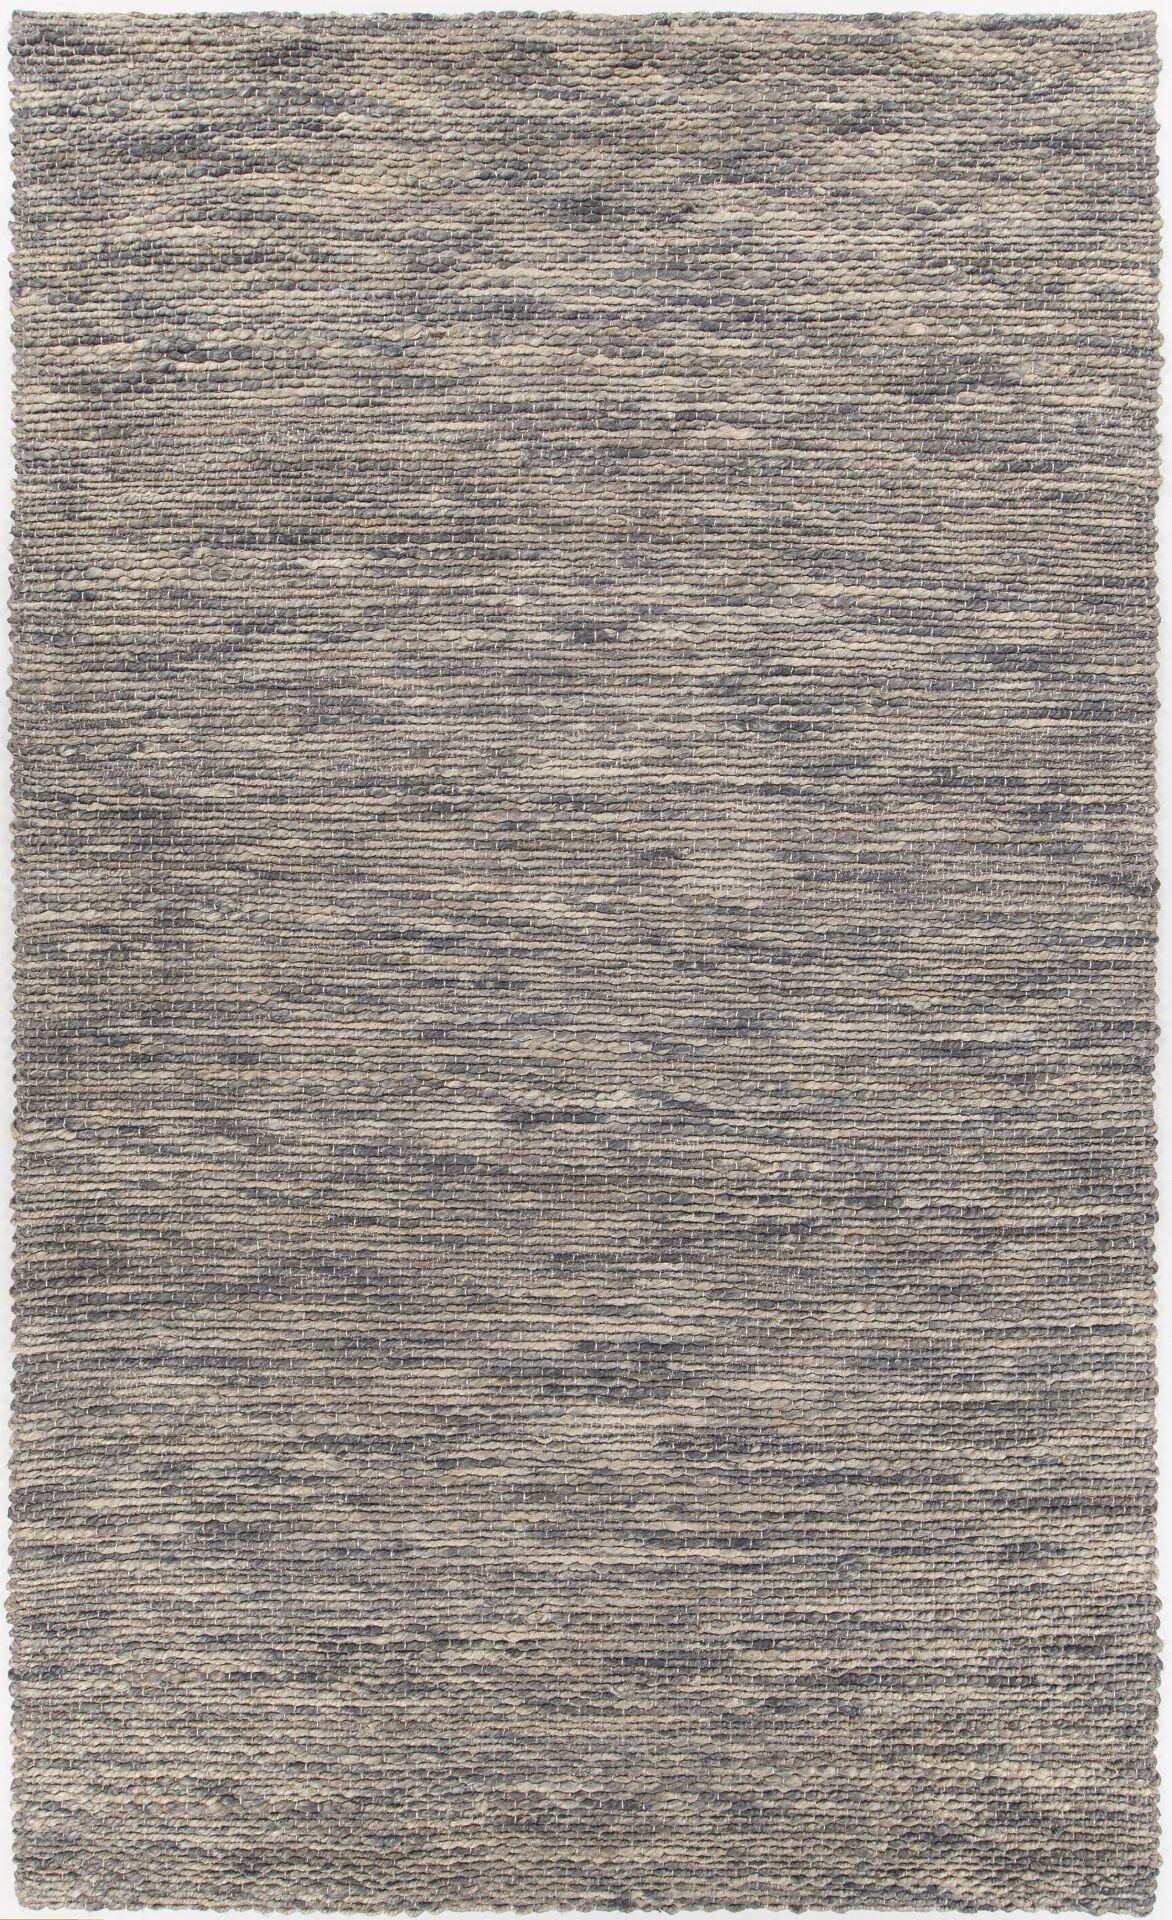 Camacho Hand-Woven Gray/Black Area Rug Rug Size: Rectangle 5' x 7'6